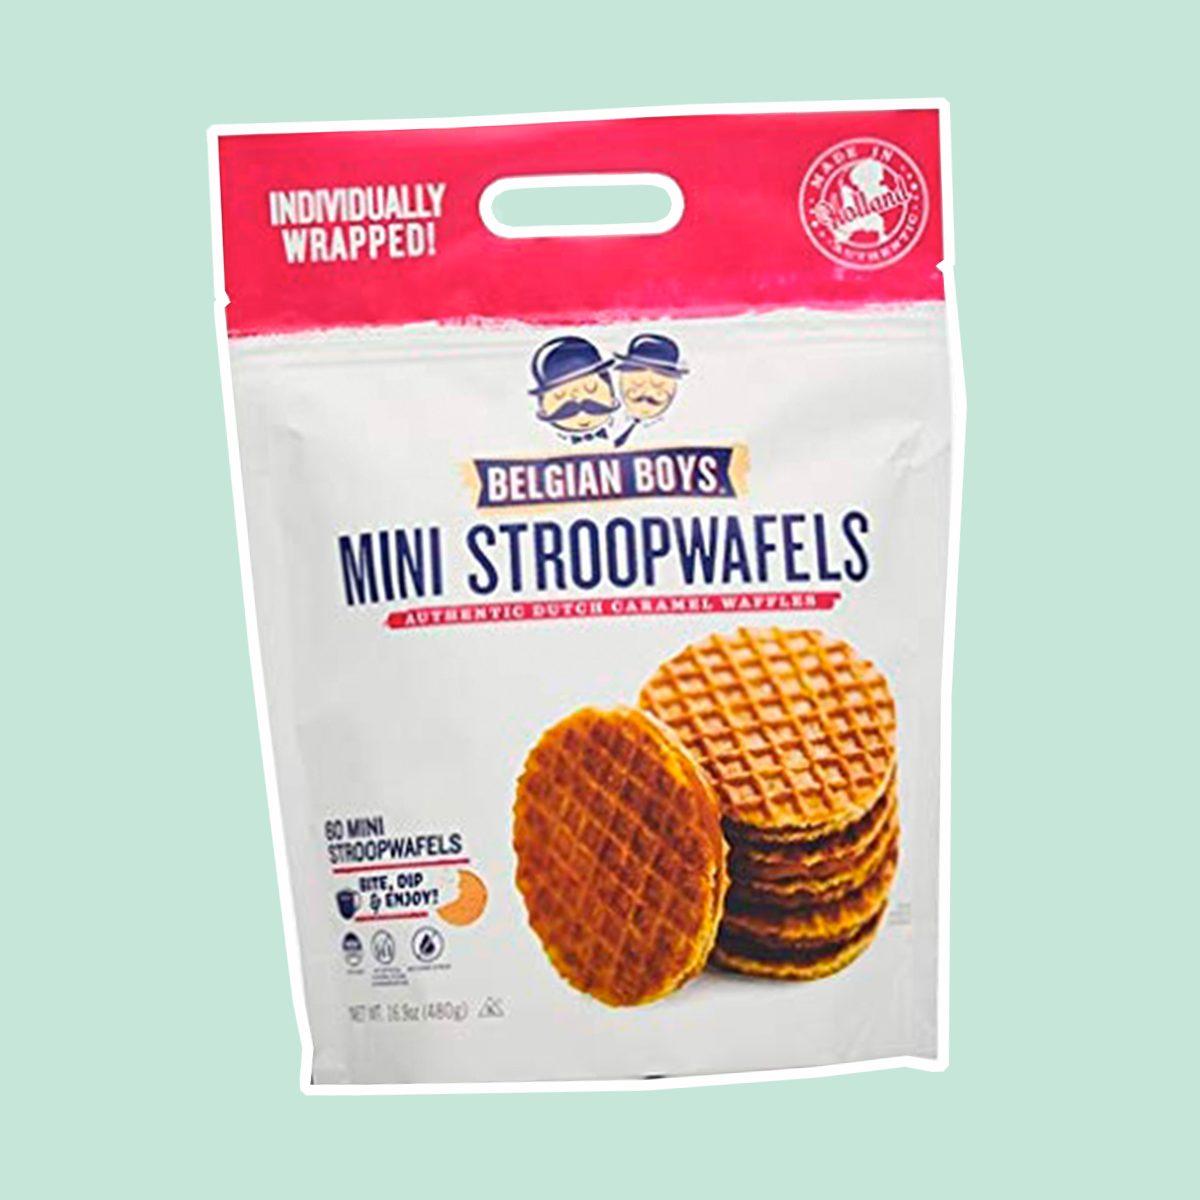 Belgian Boys Mini Stroopwafels 60 Count Authentic Dutch Caramel Waffles